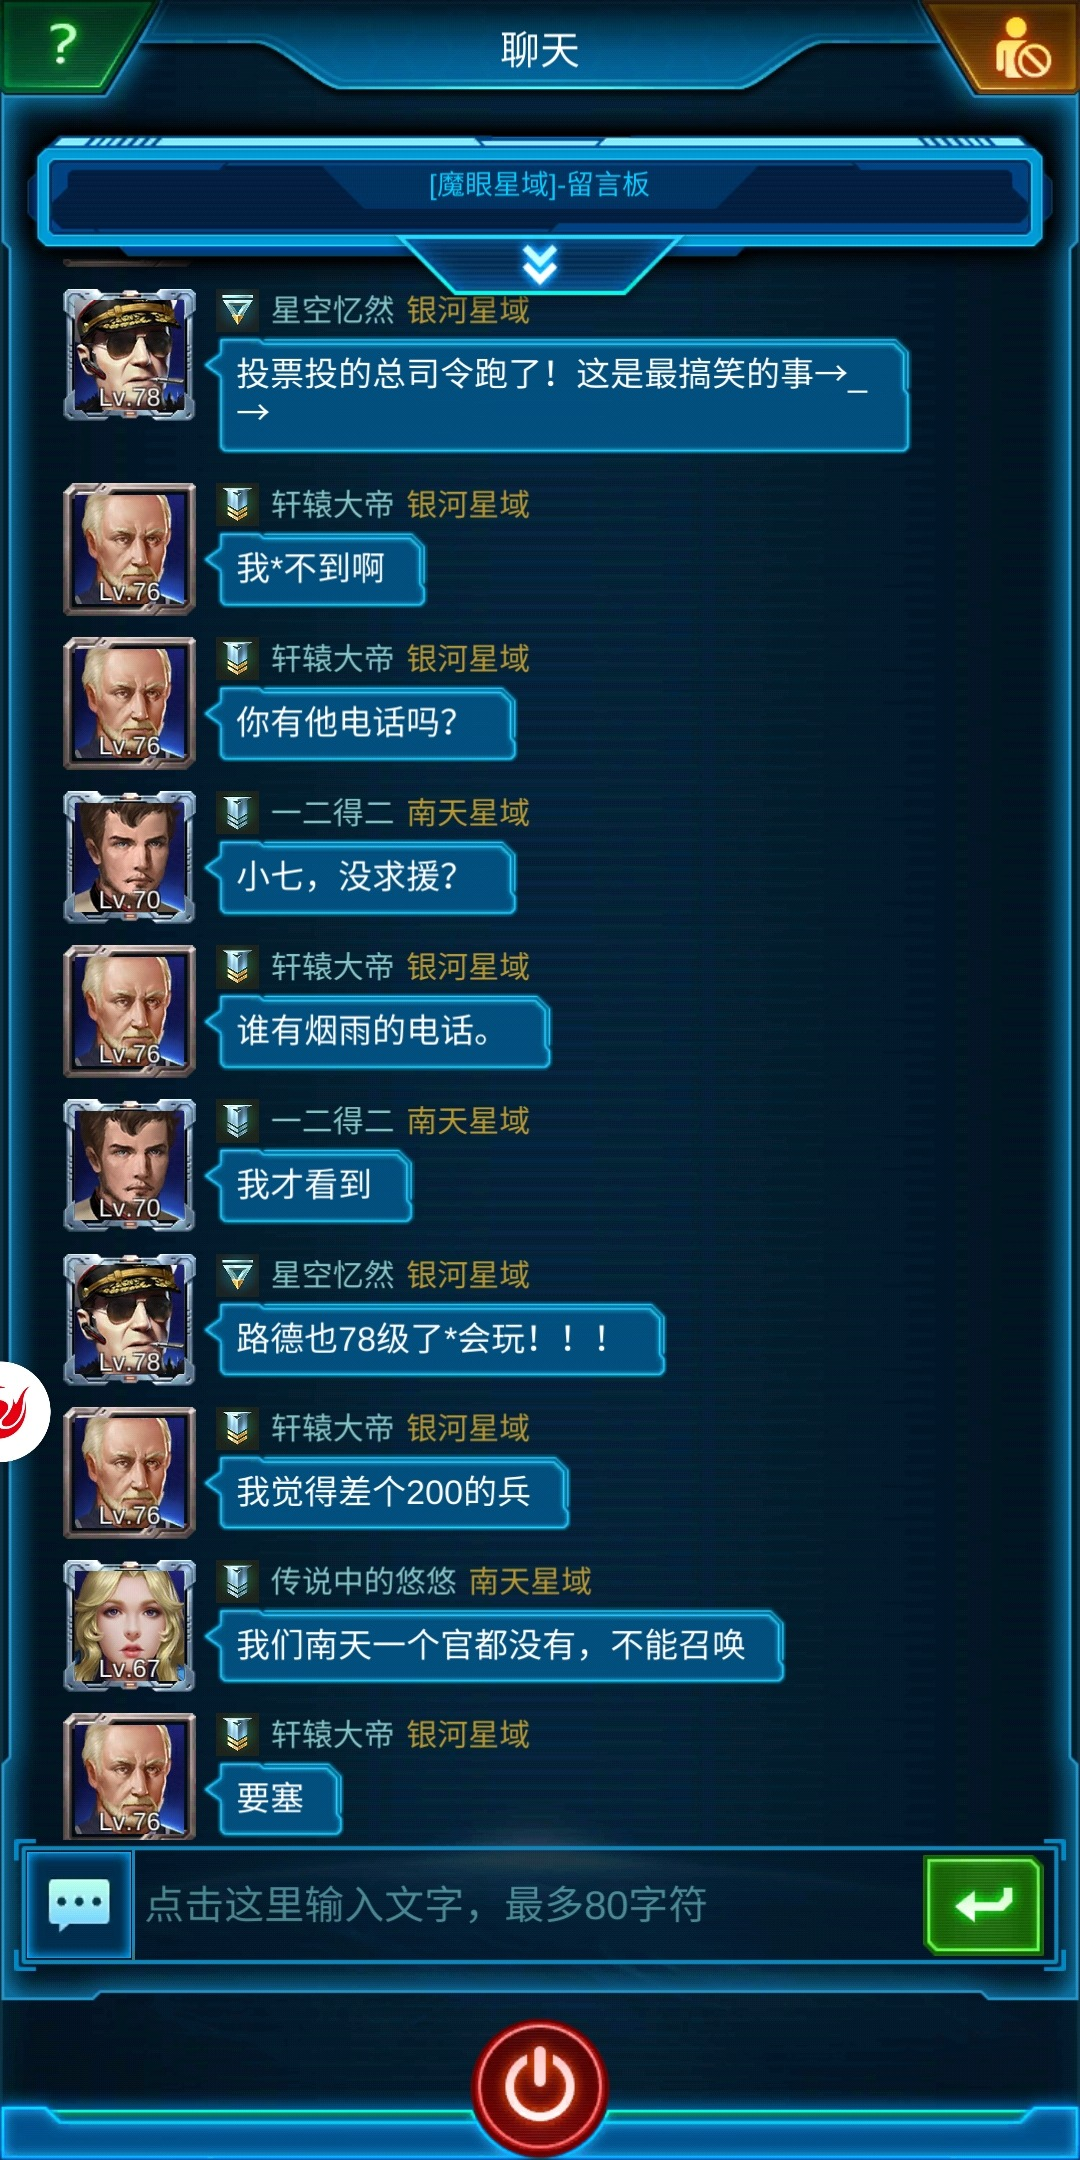 Screenshot_2020-02-15-20-23-05-556_com.jedigames.p16s.luobo.jpg